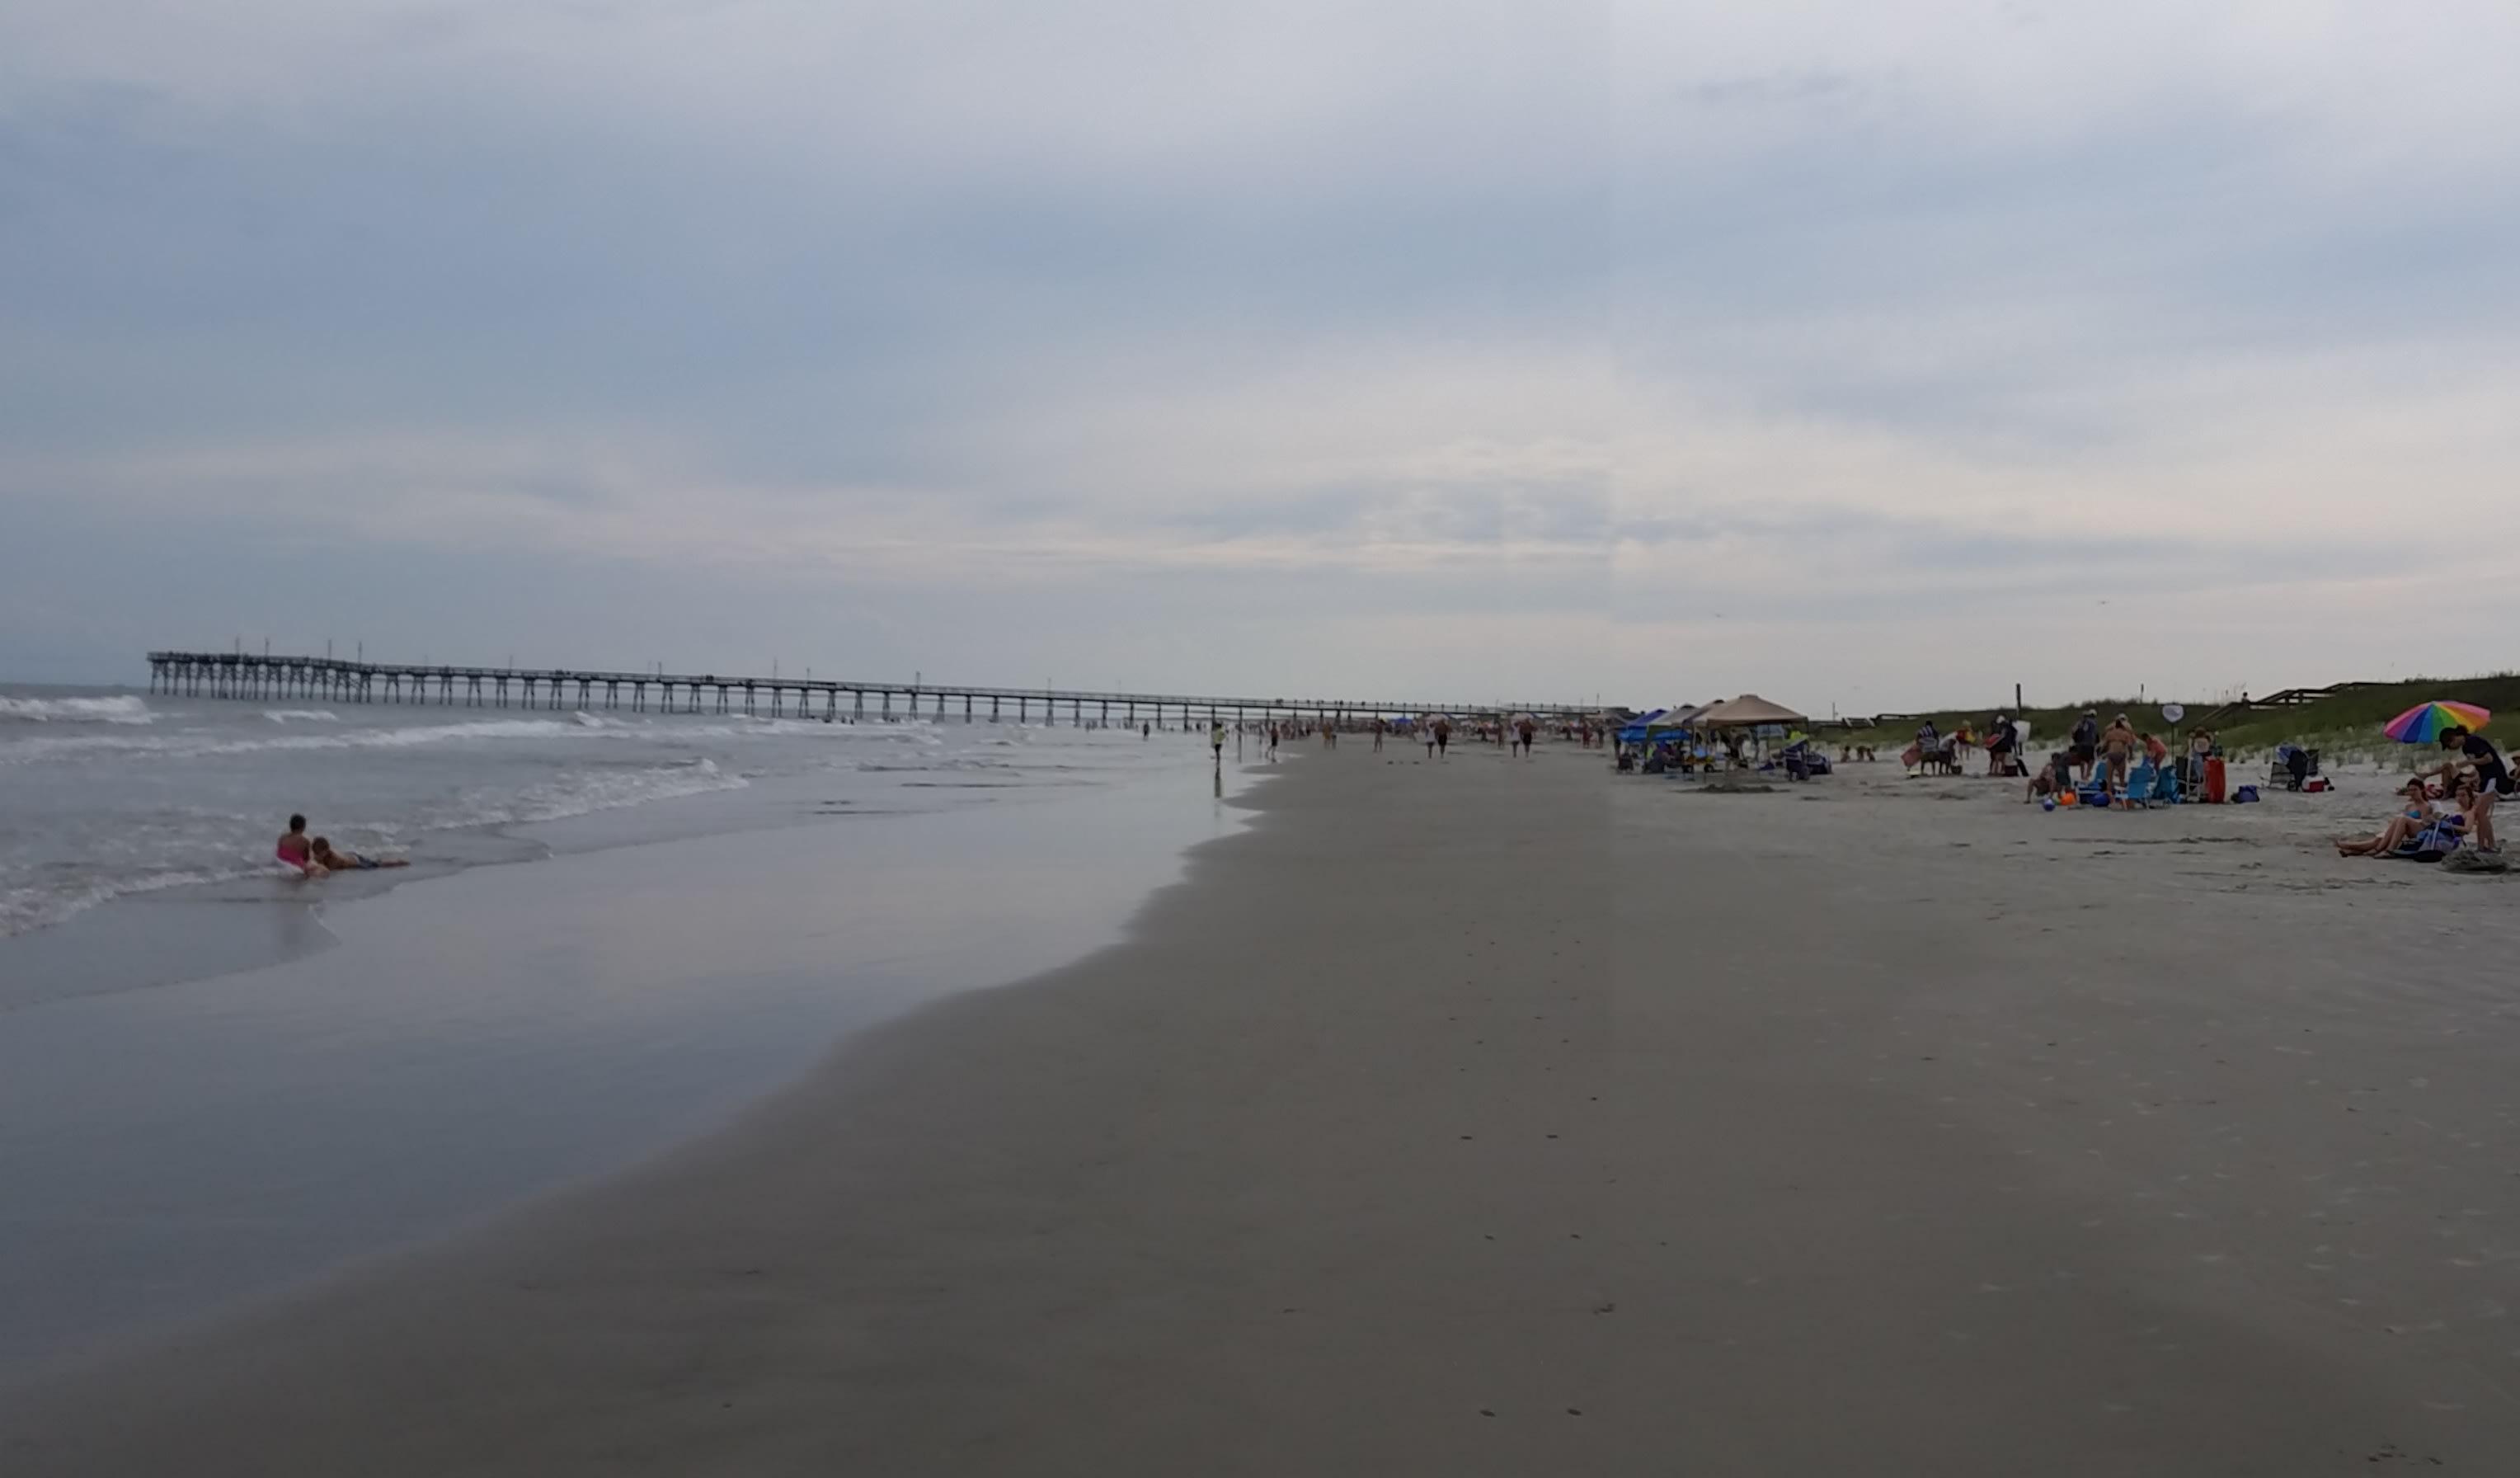 Sunset Beach, one of America's top 25 beaches!